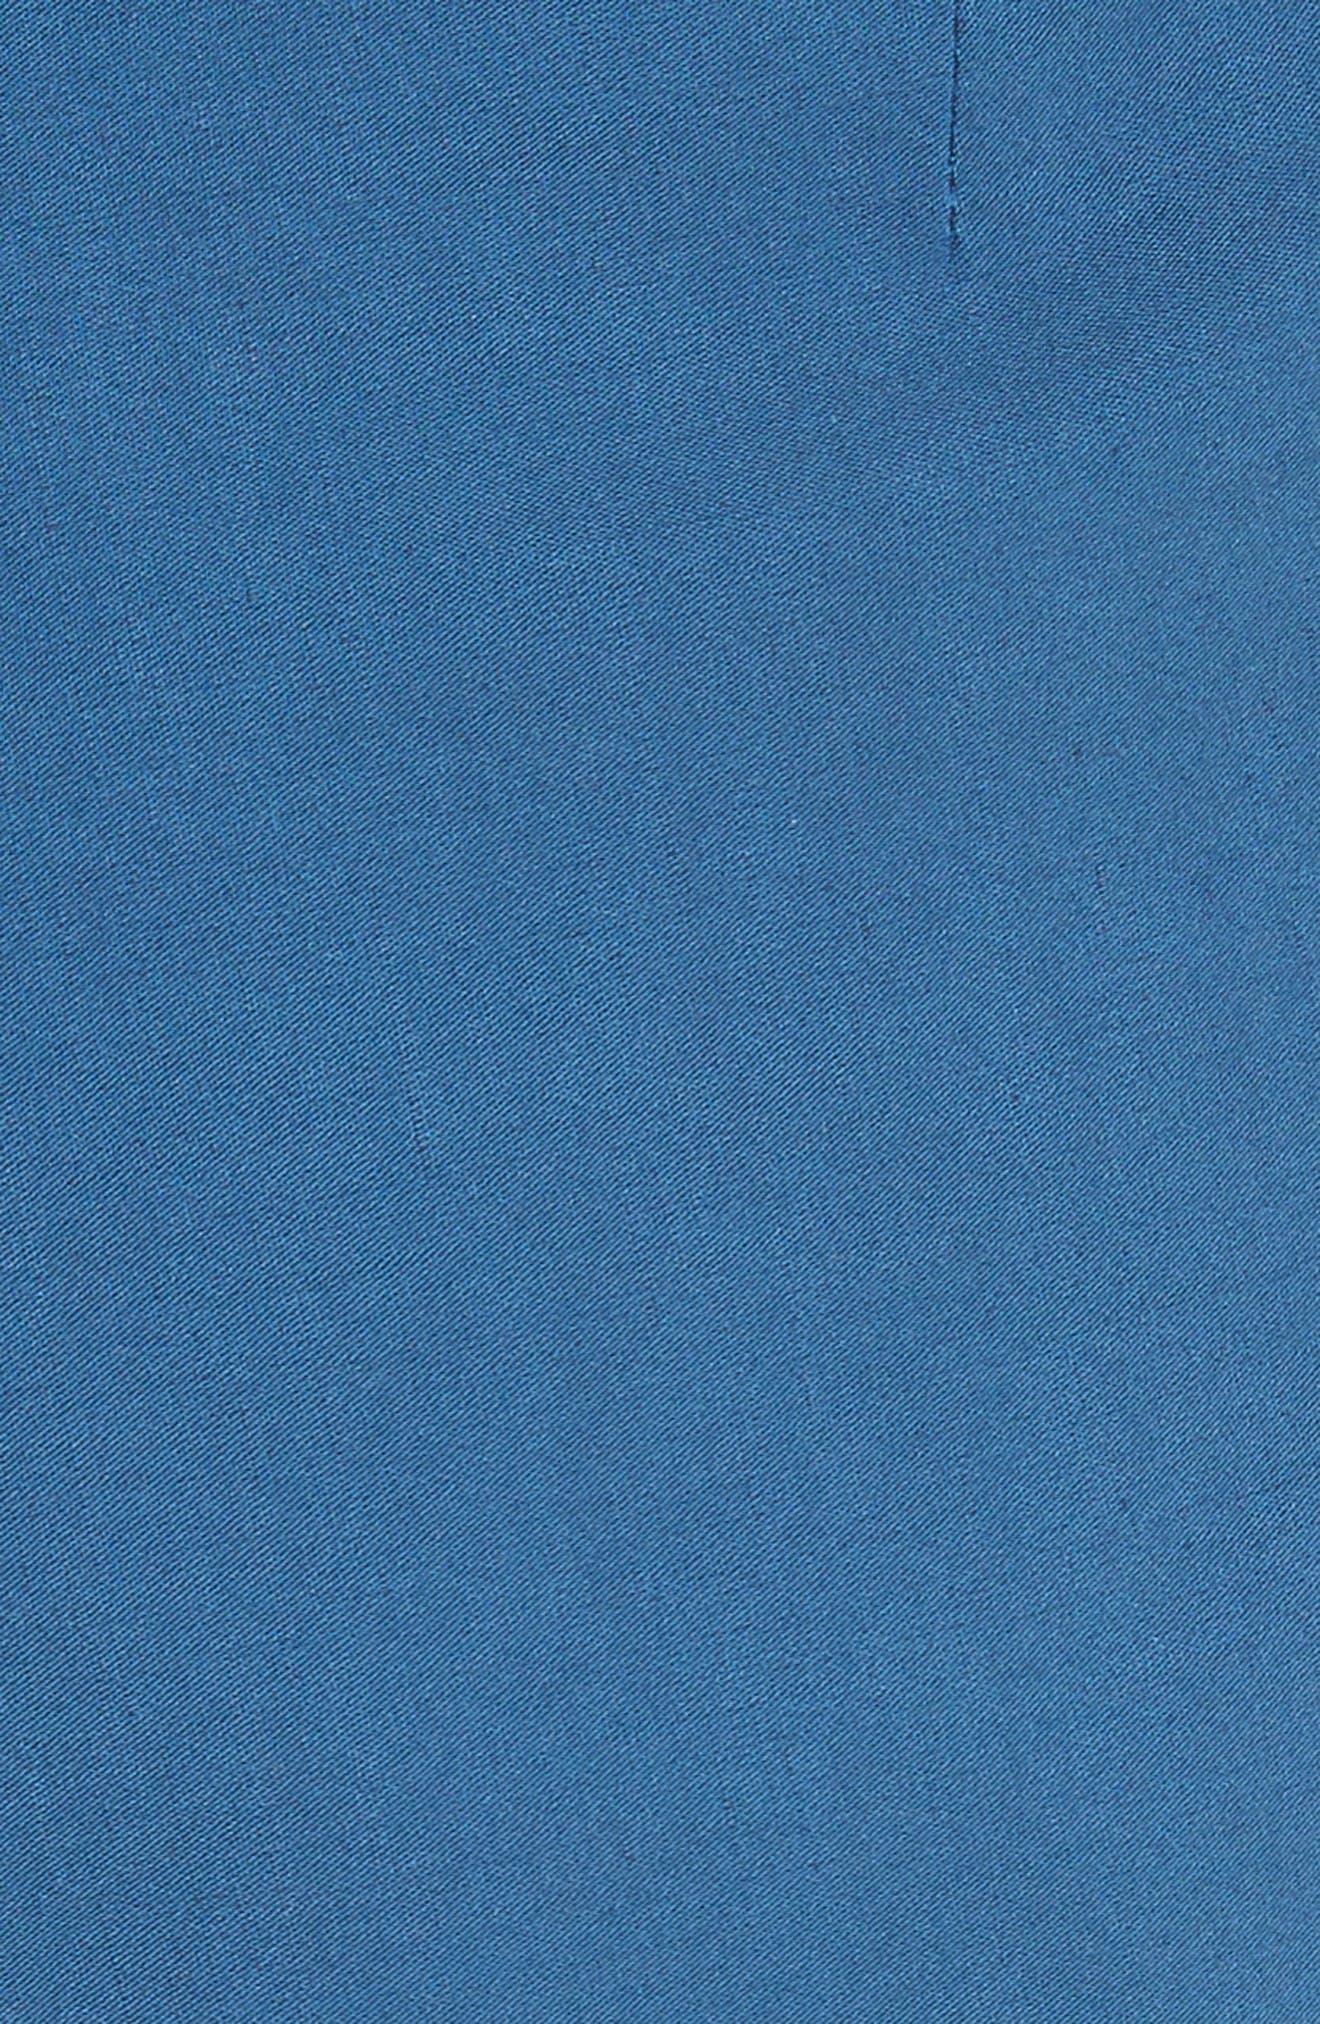 Poppy Belted Cotton & Linen Blend Shorts,                             Alternate thumbnail 5, color,                             400